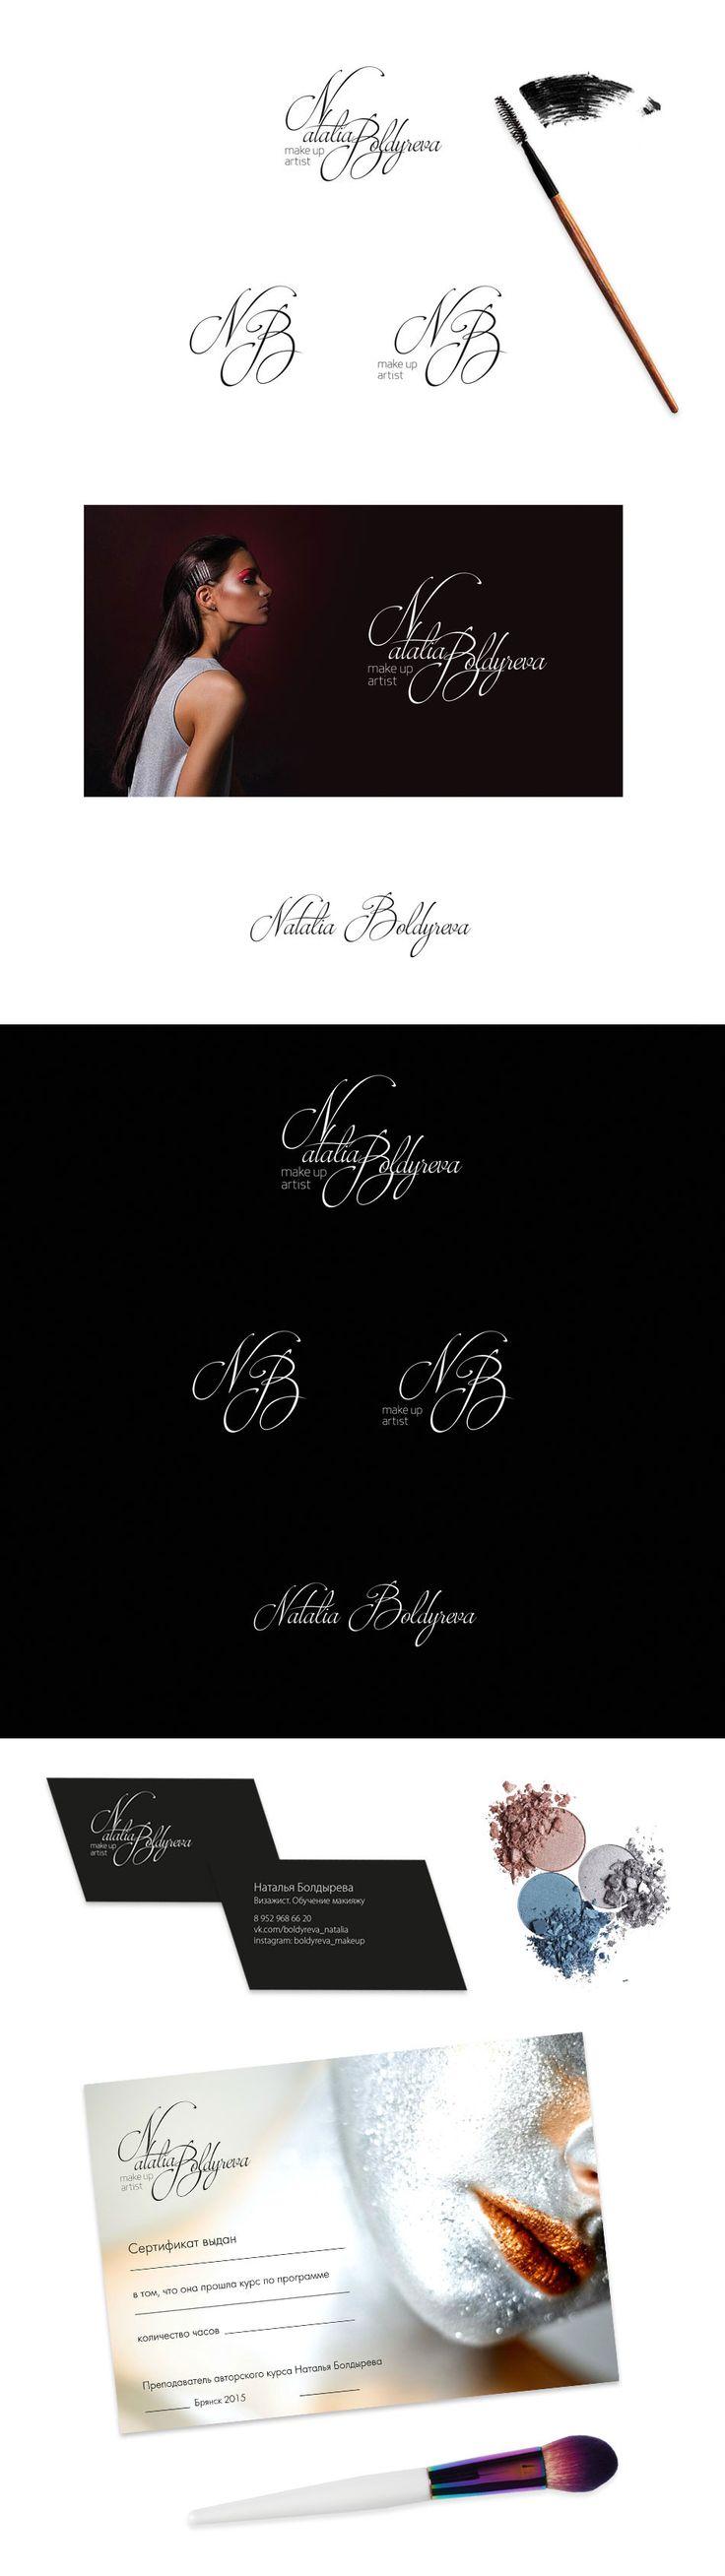 "Логотип и дизайн визиток для визажиста - Агентство интернет-индустрии и дизайна ""R-BAND"""